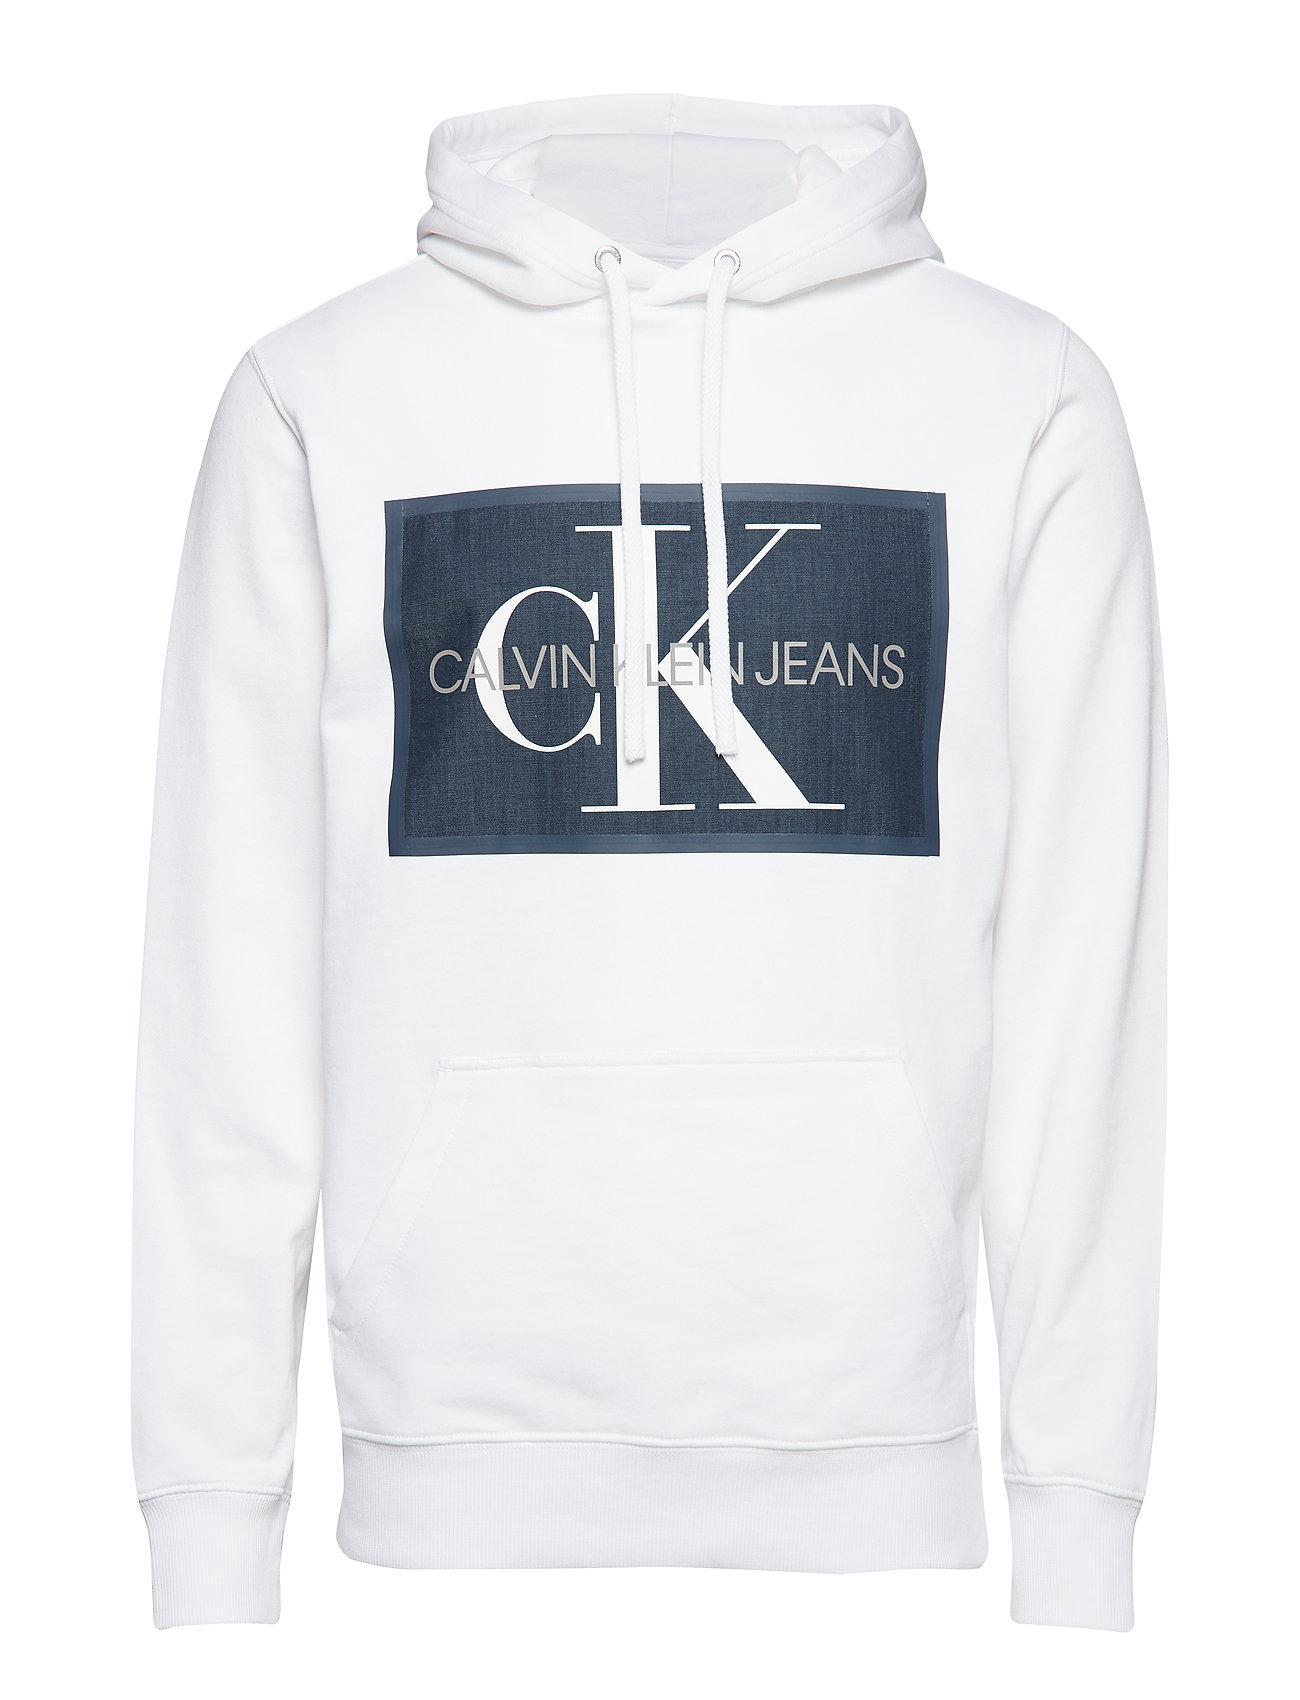 Chambray Klein Hobright WhiteCalvin Jeans Monogram drxBeCWo